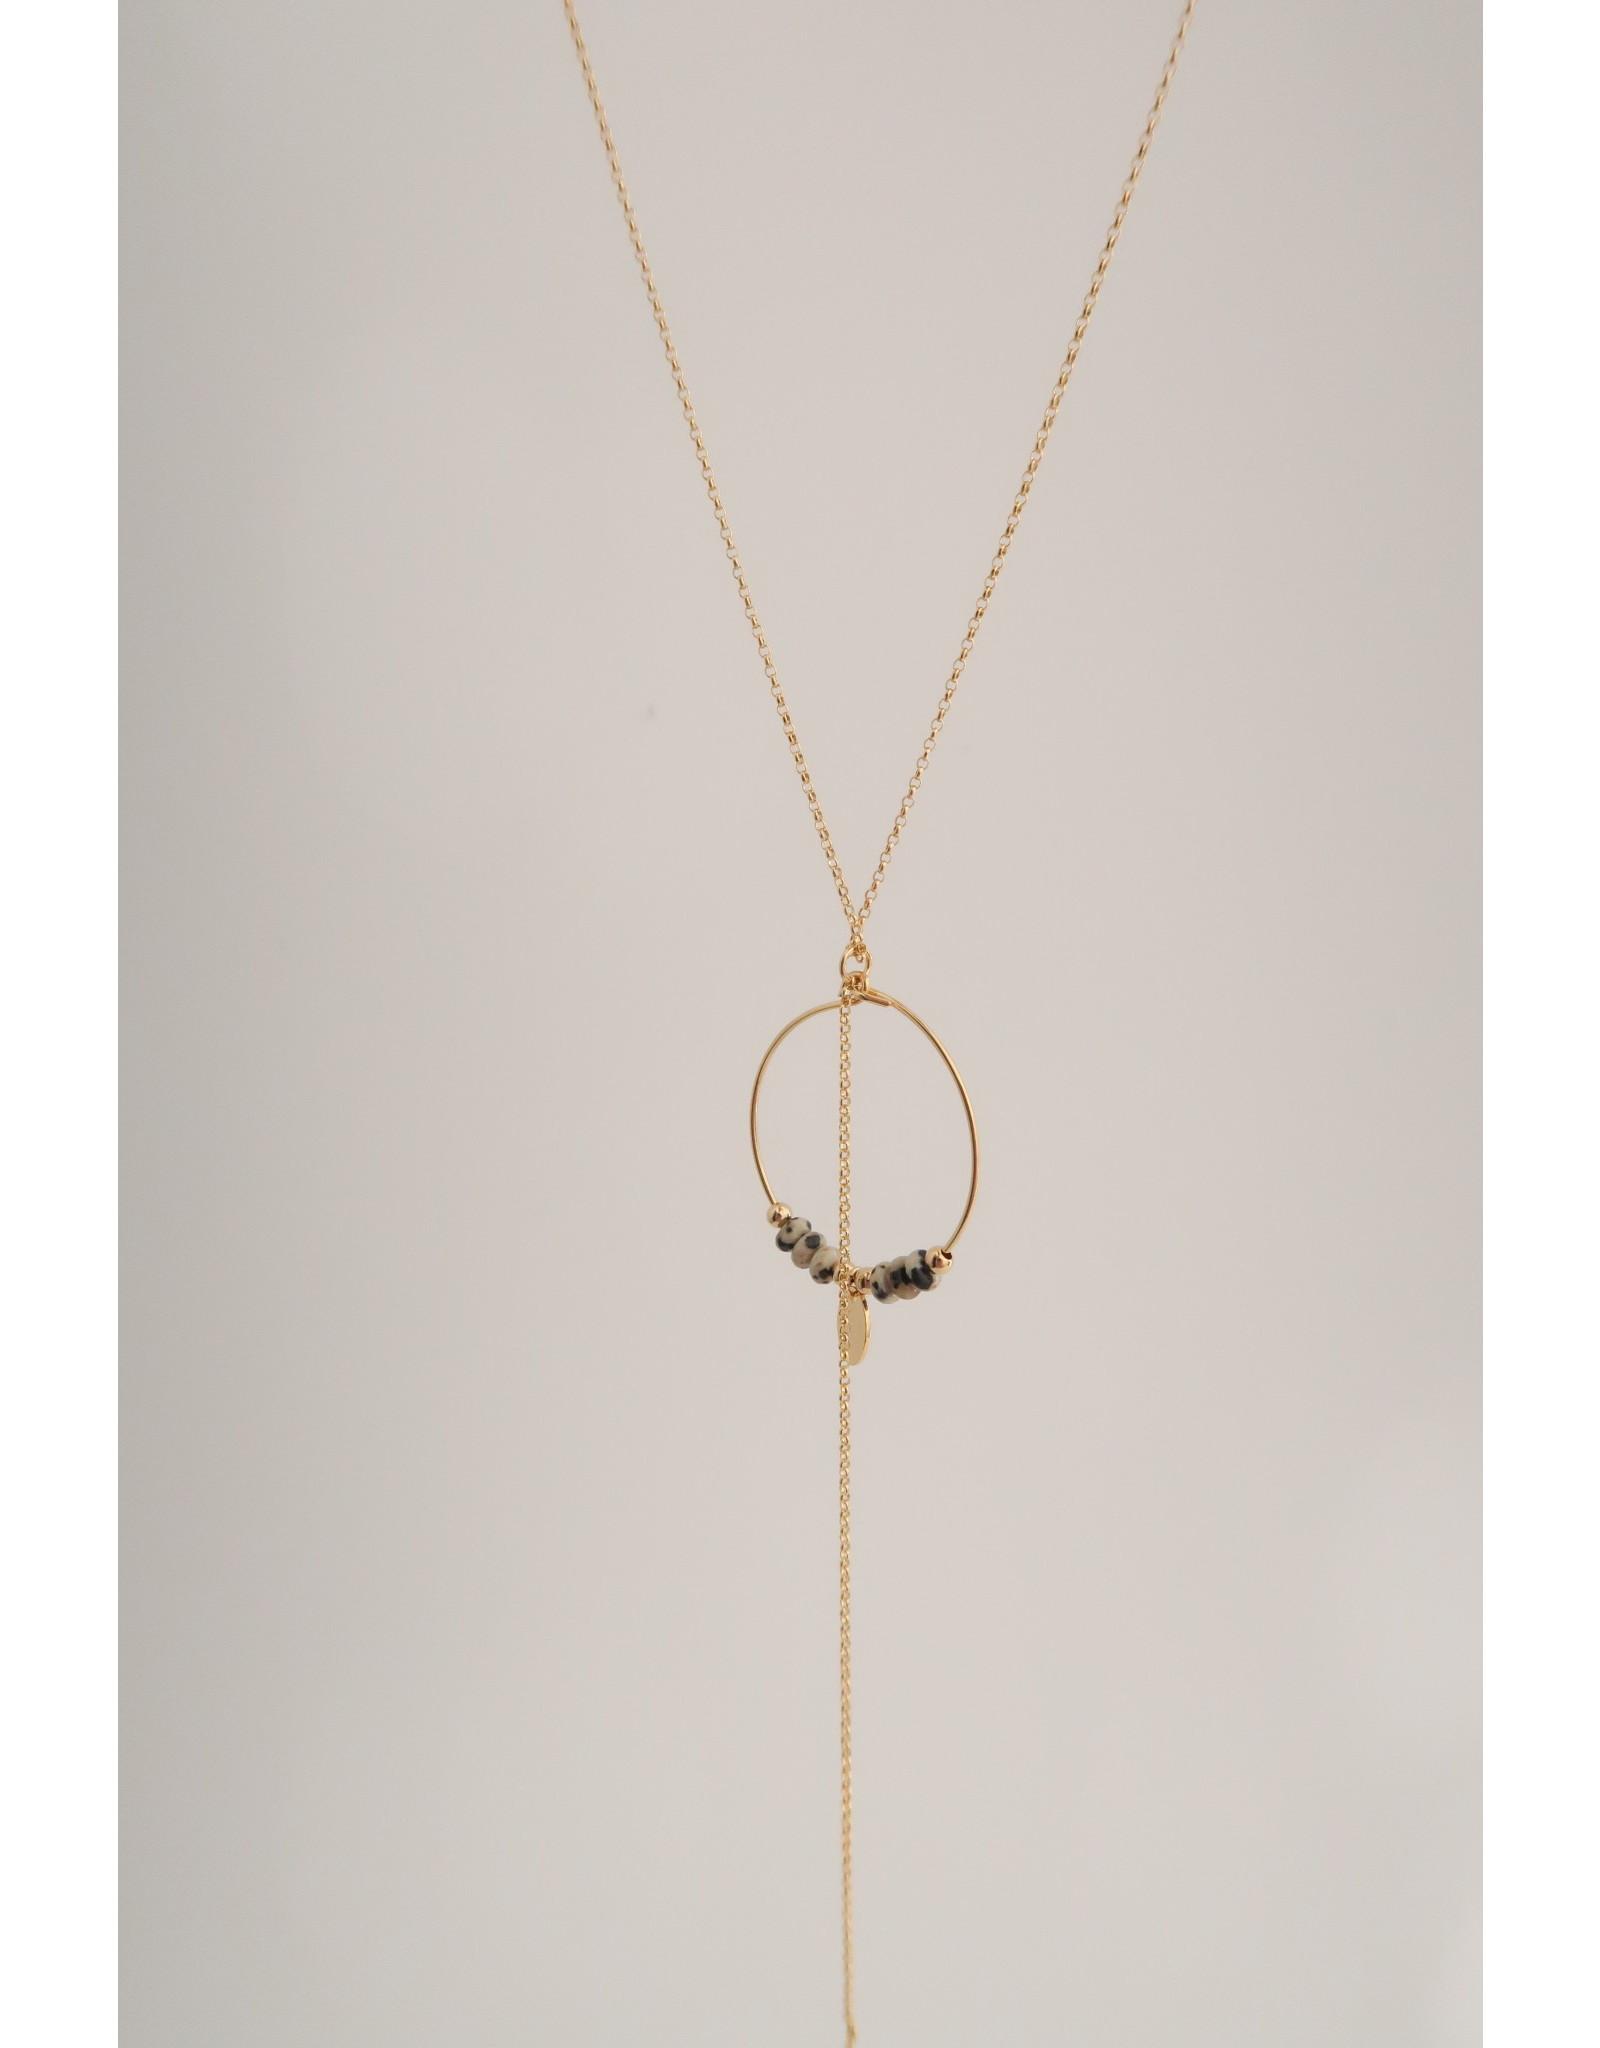 Murielle Perotti halsketting MP leopard creool/goud 50cm